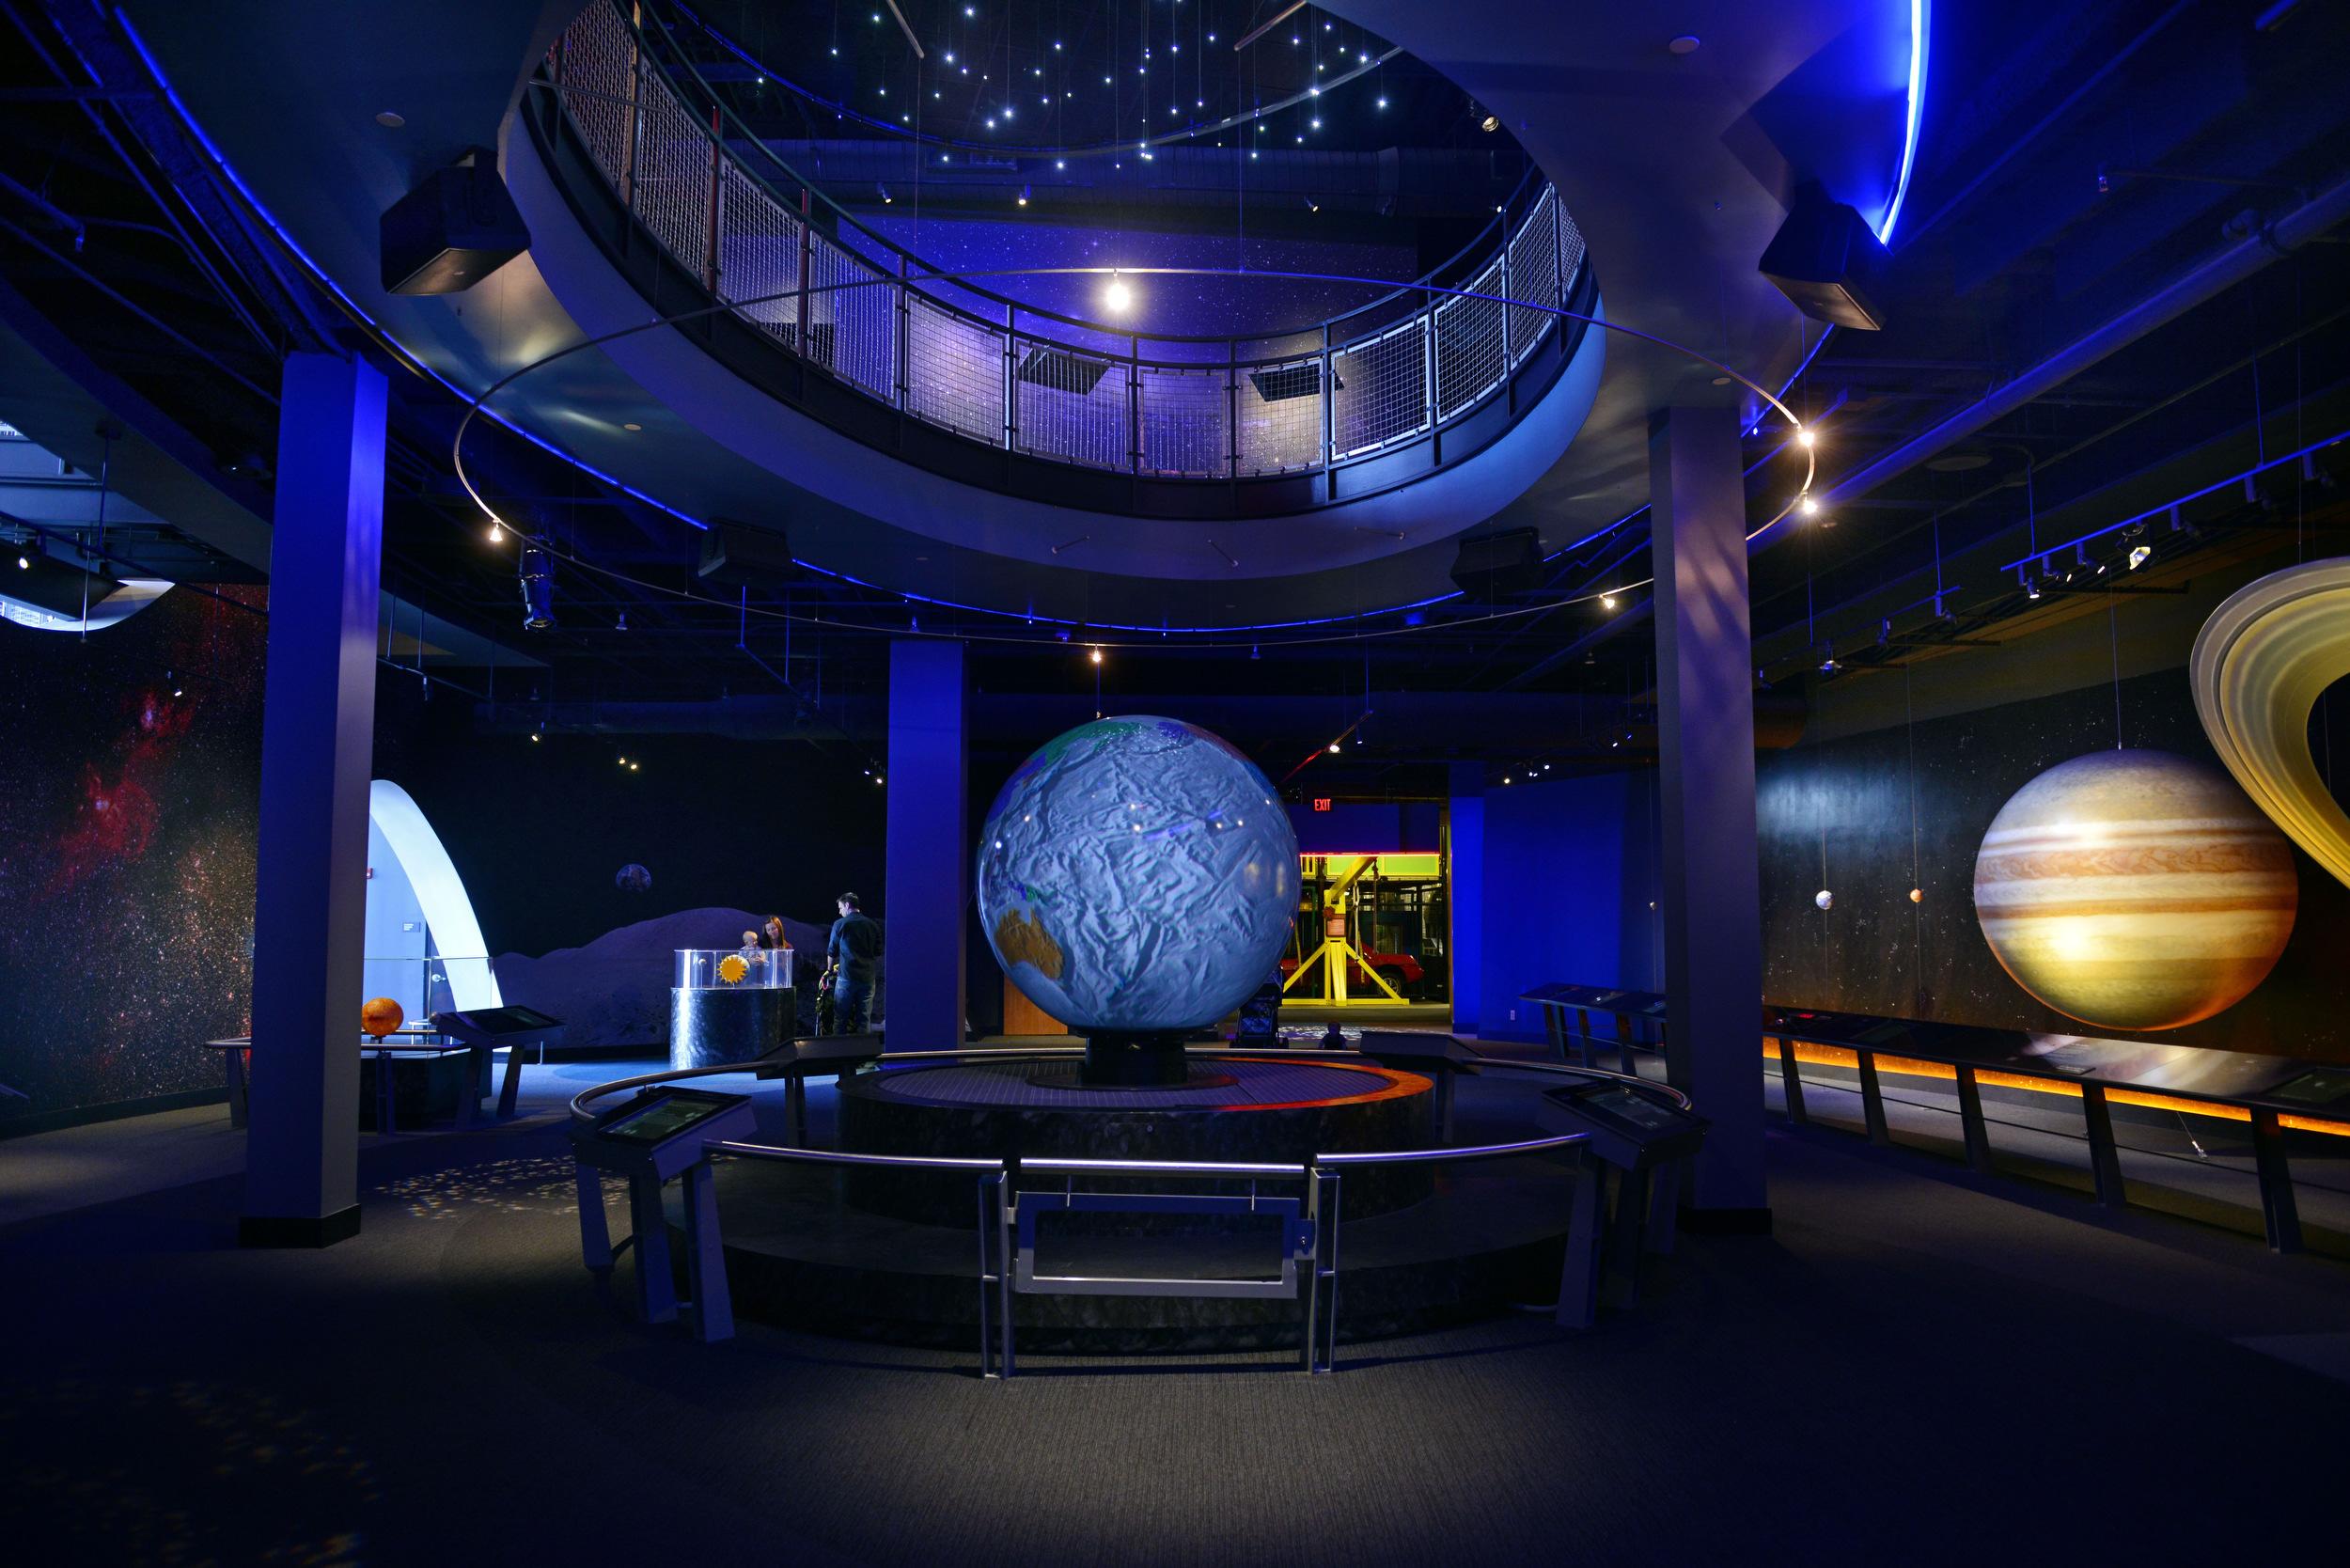 The Adventure Science Center in Nashville, Tenn.